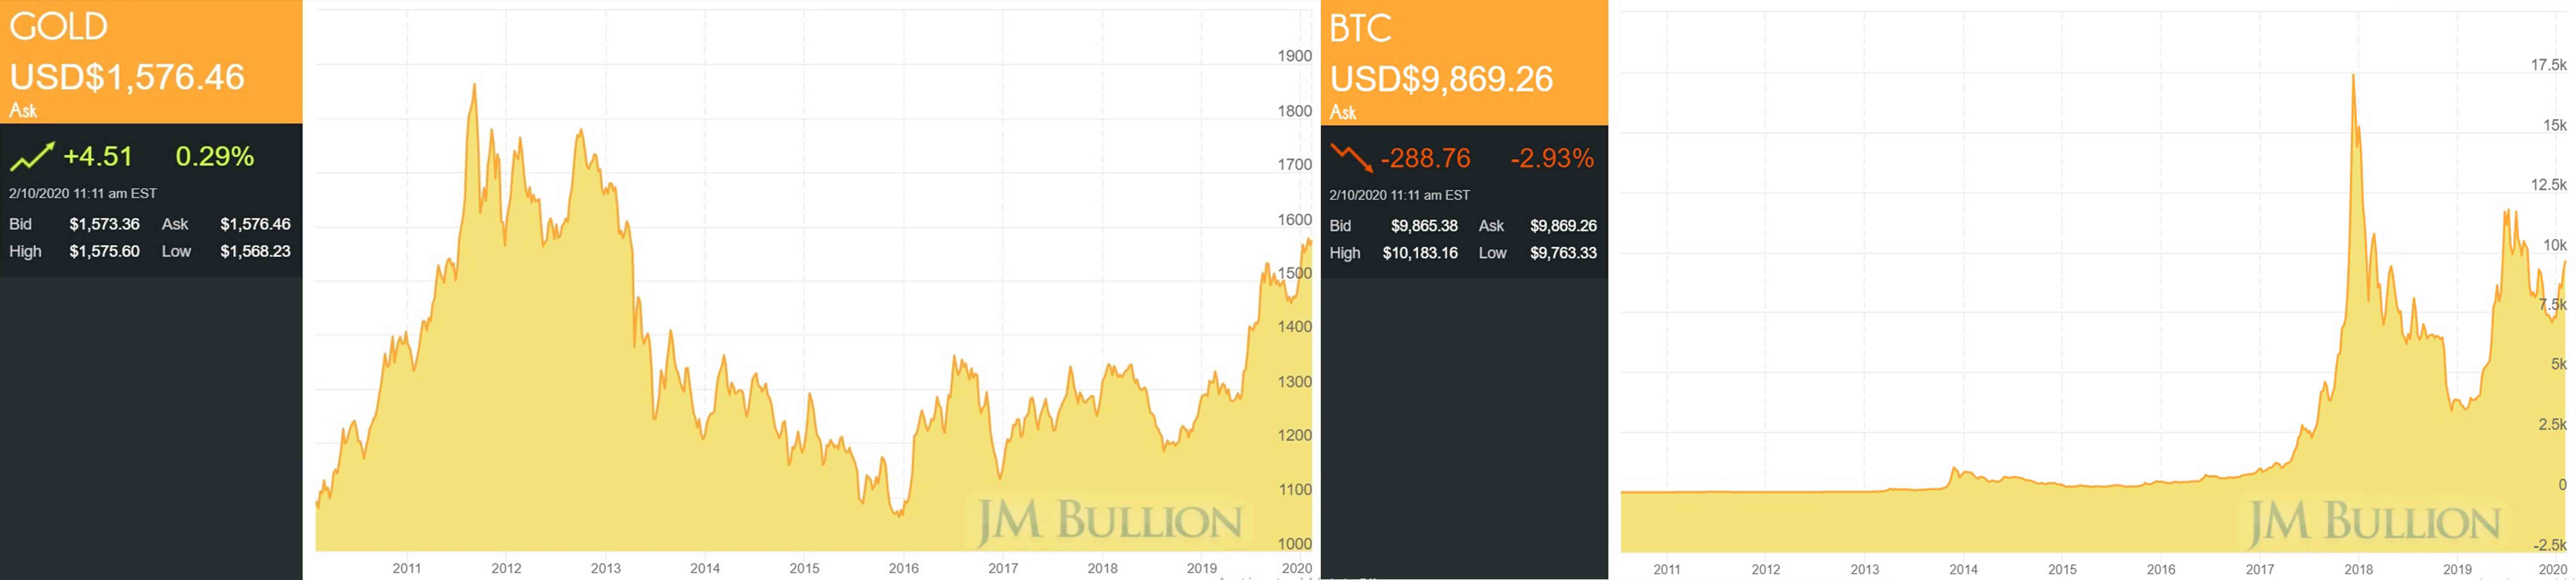 50% fölött a Bitcoin dominancia